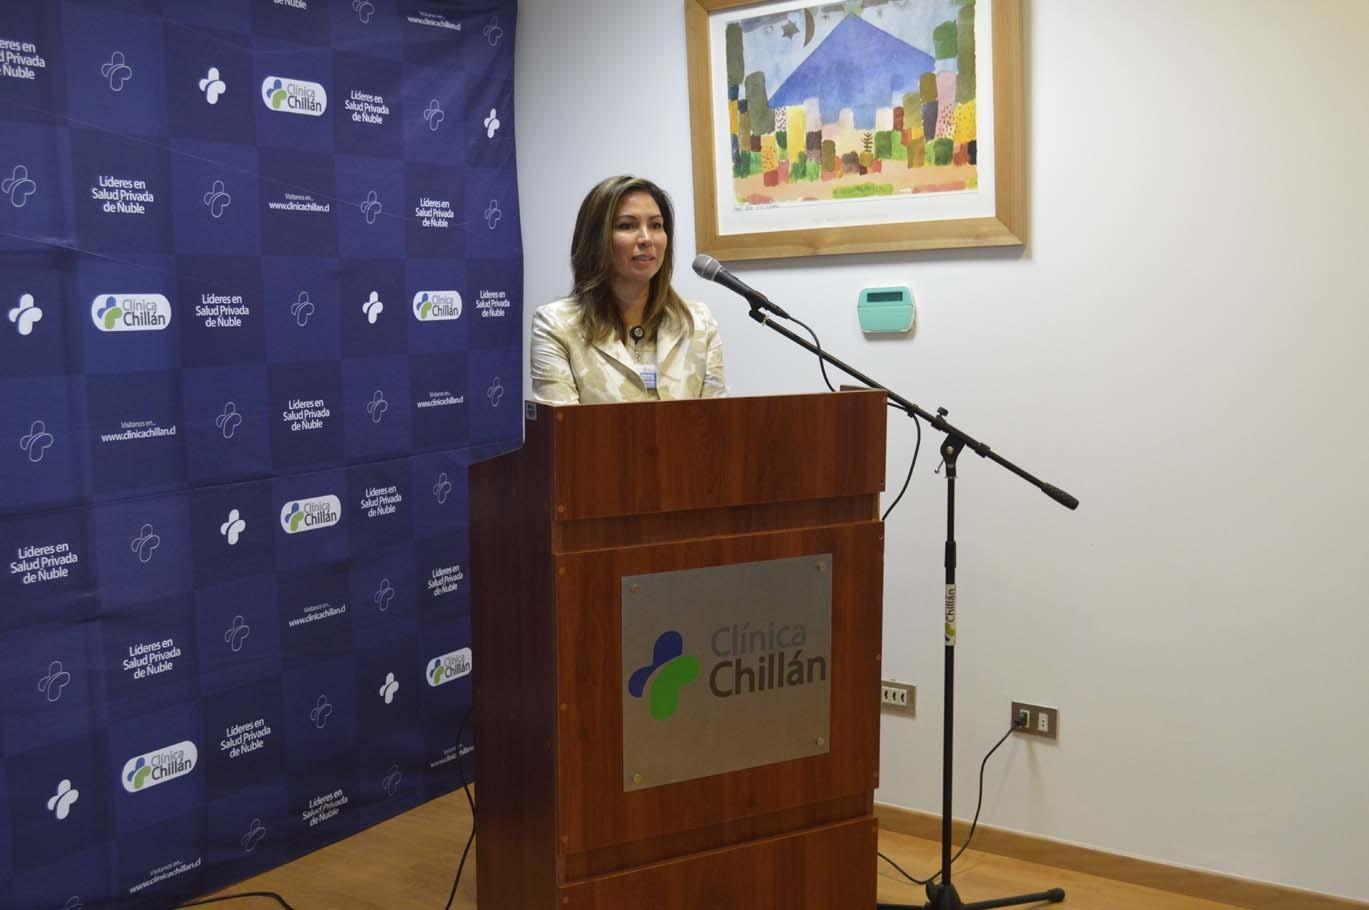 Mónica Jiménez, gerente general de Clínica Chillán